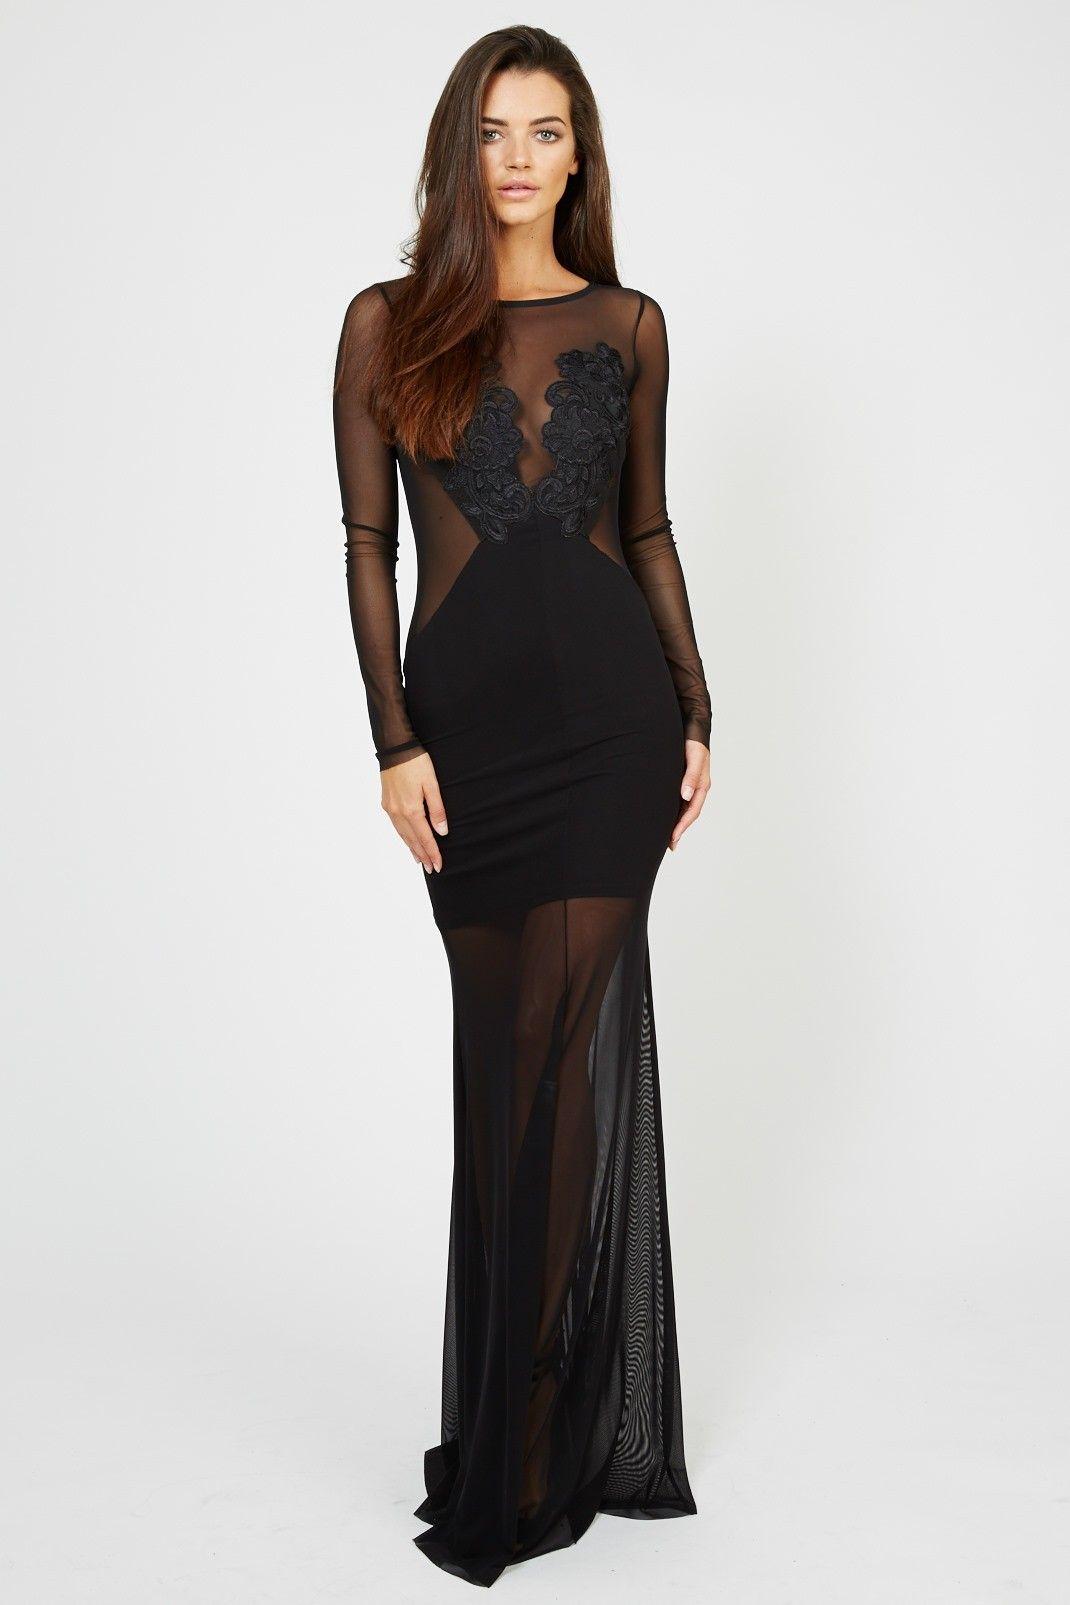 17 best images about Black Maxi Dress on Pinterest | Best style ...